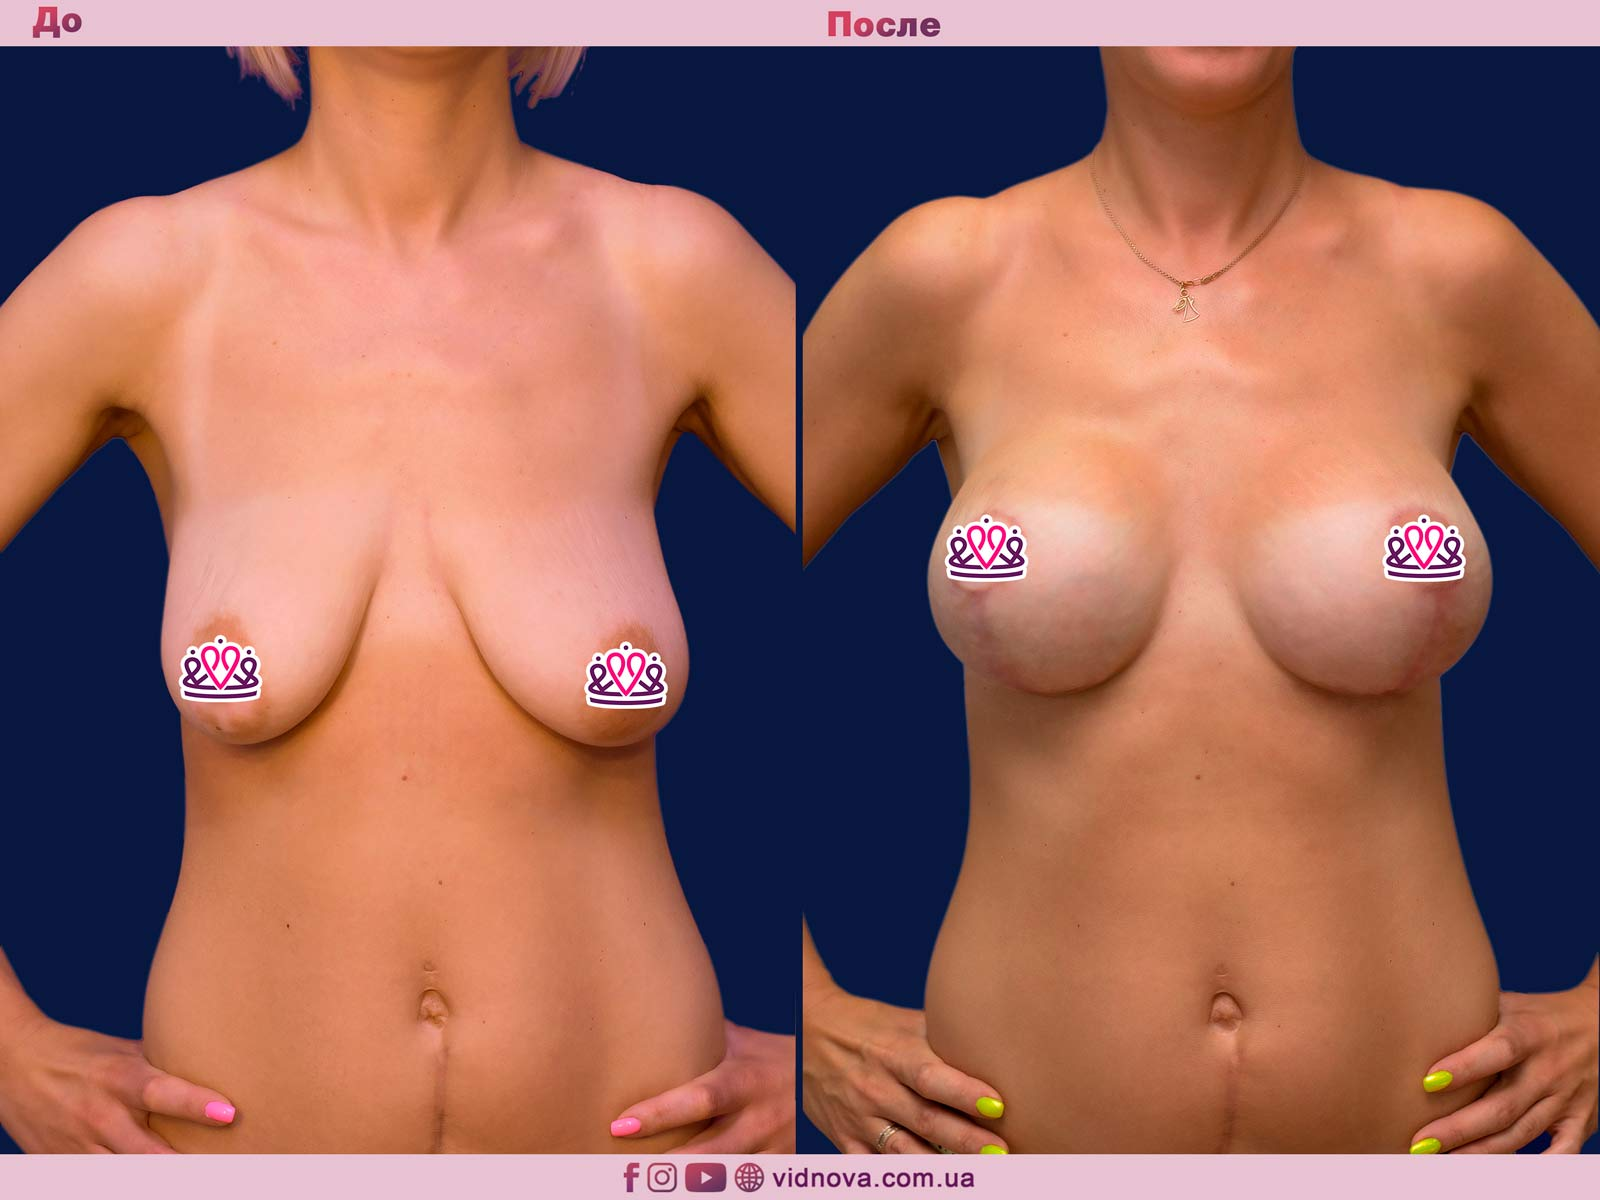 Подтяжка груди: Фото ДО и ПОСЛЕ - Пример №25-1 - Клиника Vidnova